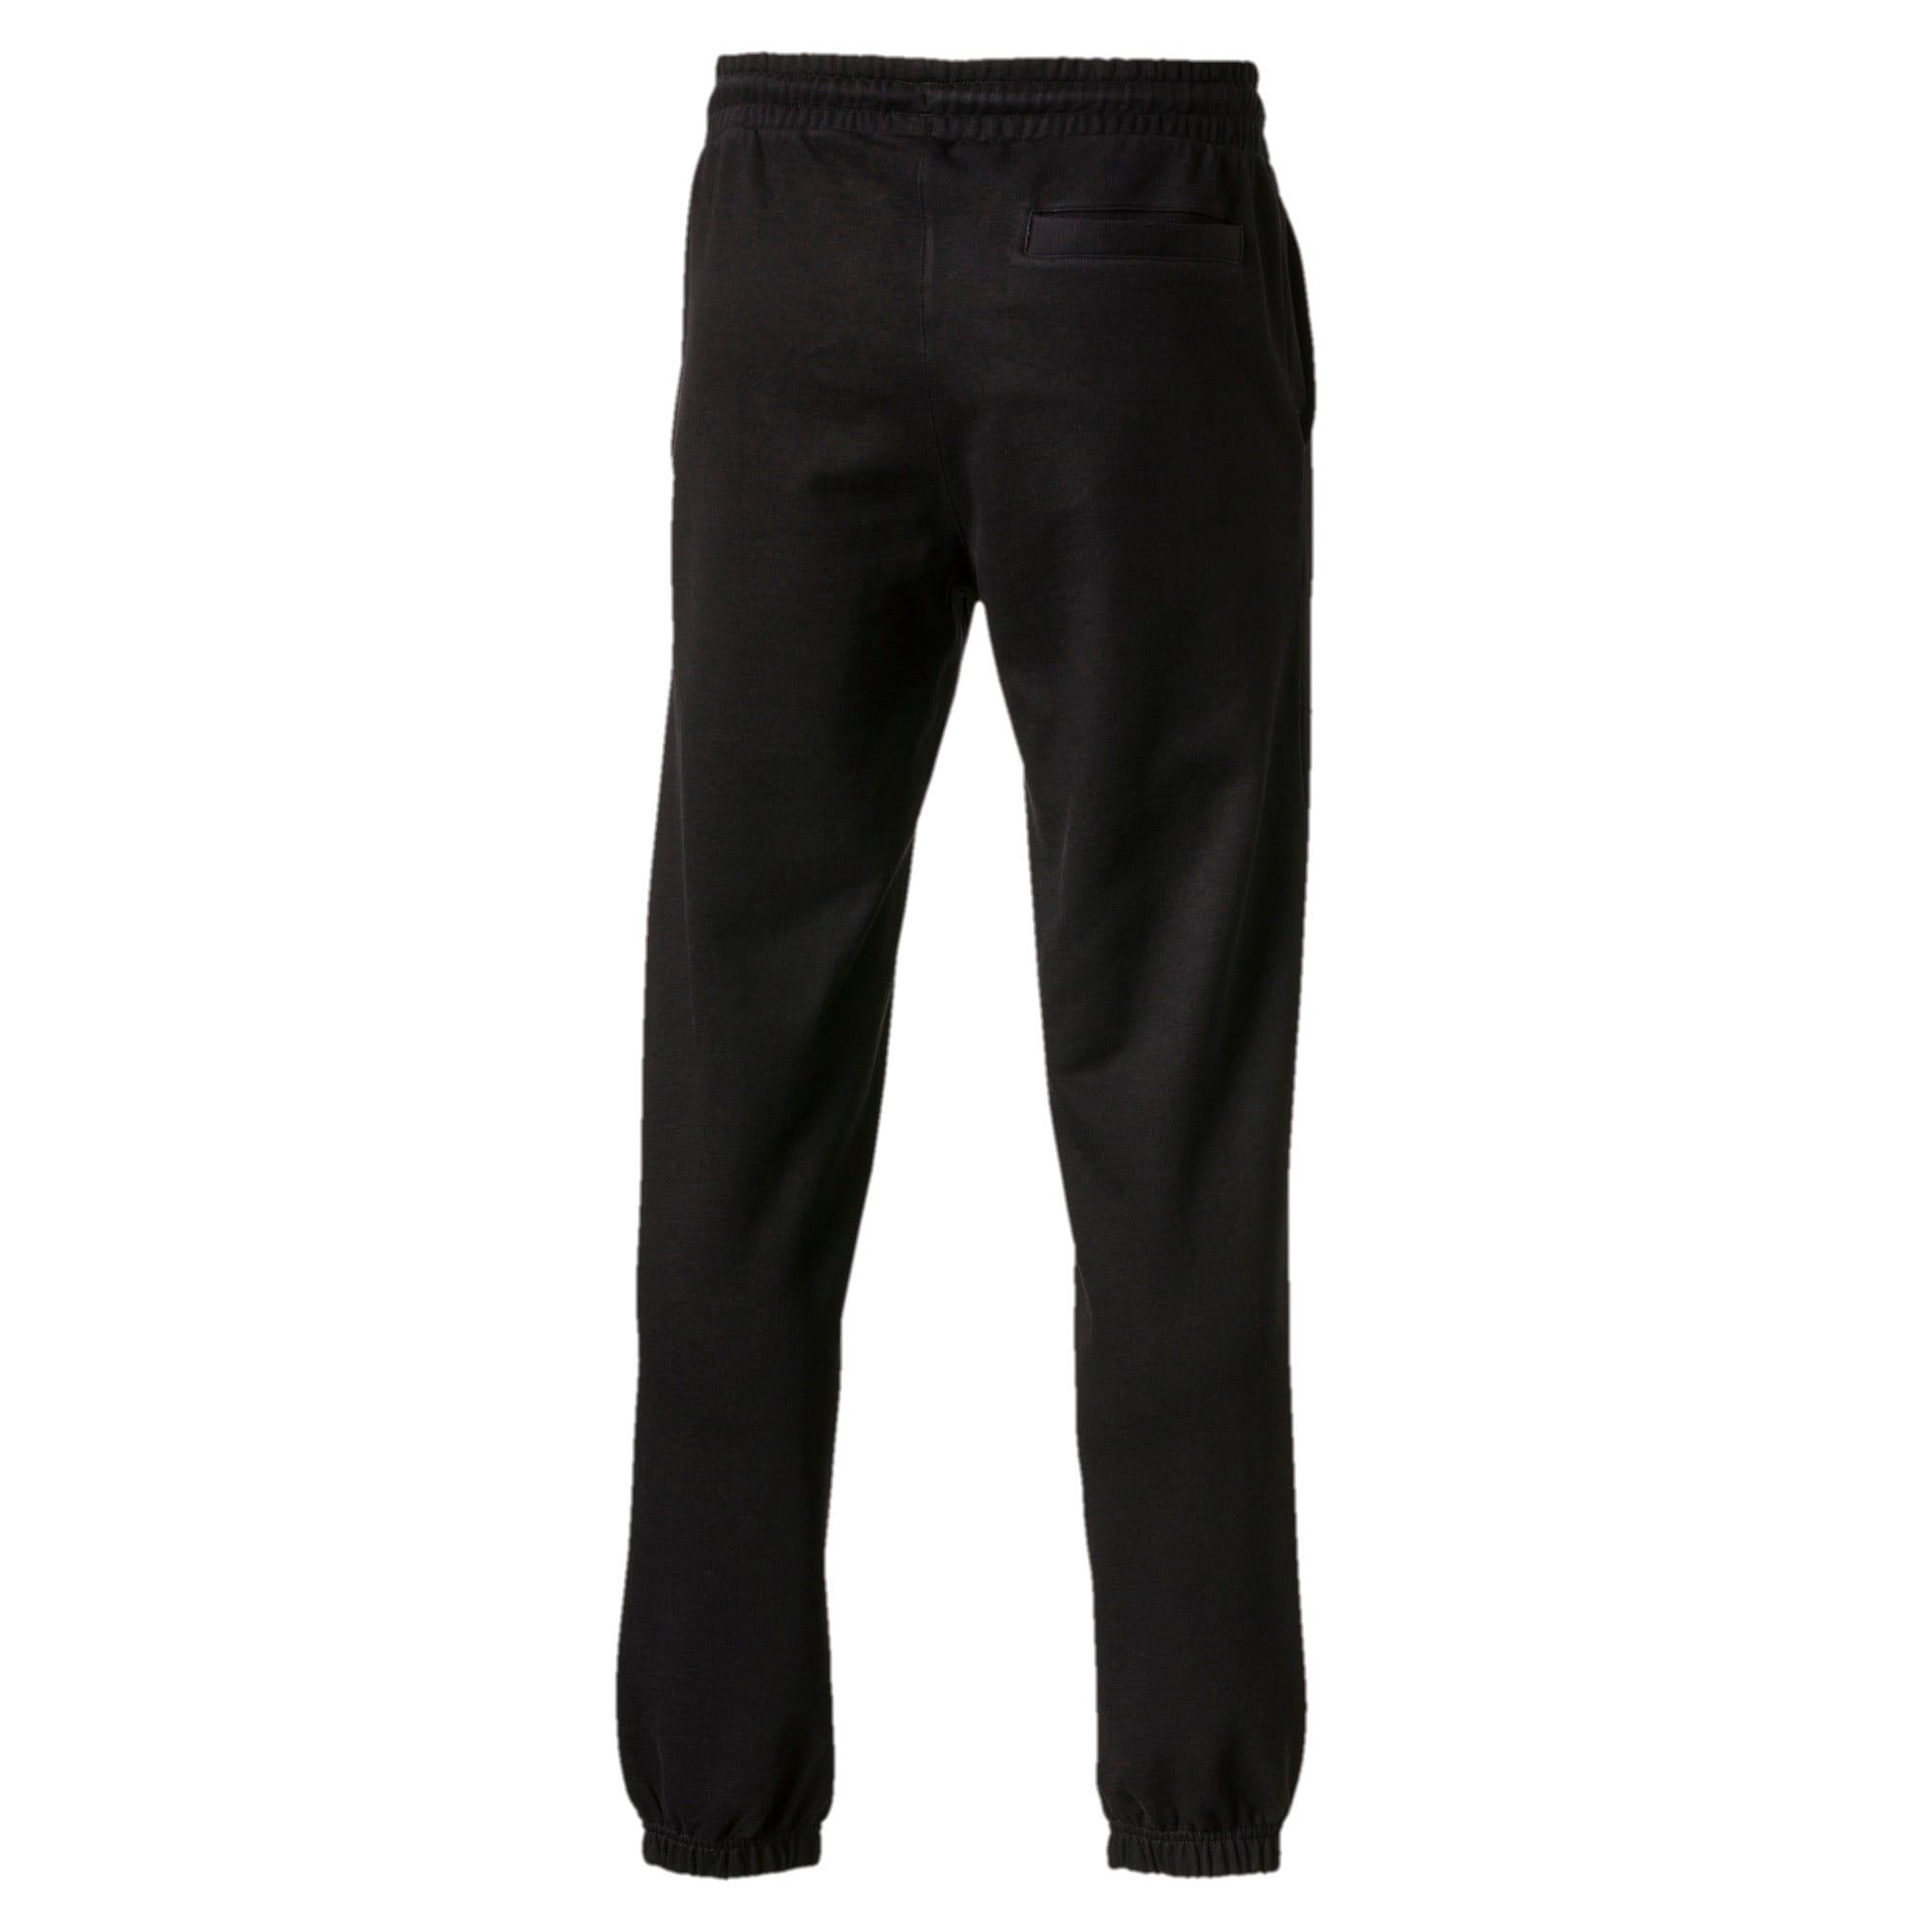 Thumbnail 3 of OG Men's Cuffed Pants, Puma Black, medium